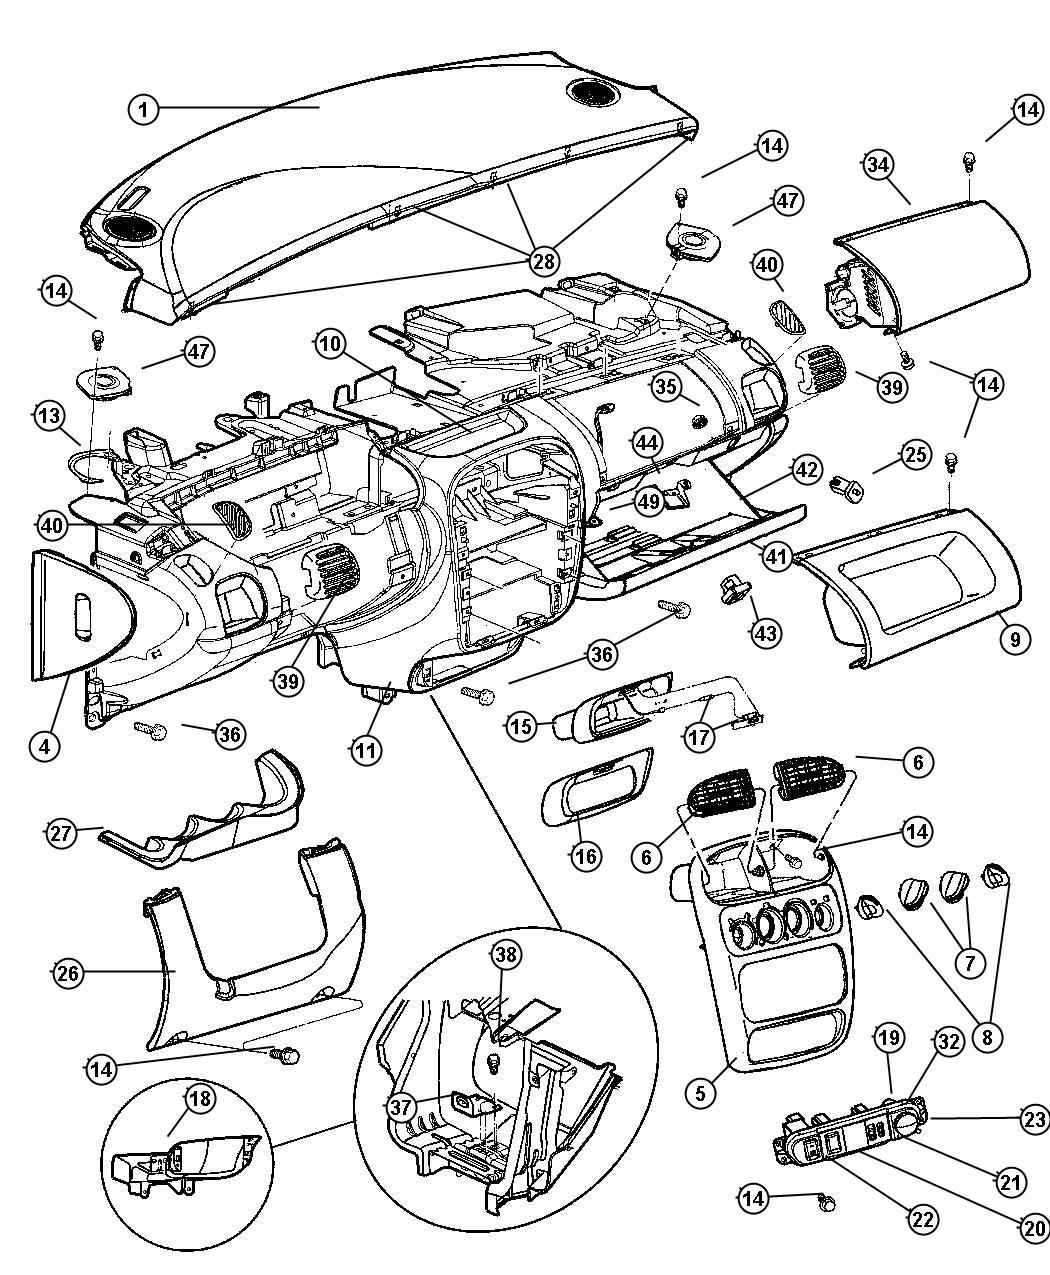 Dodge Neon Cover. Instrument panel. [dv][turbo boost gauge